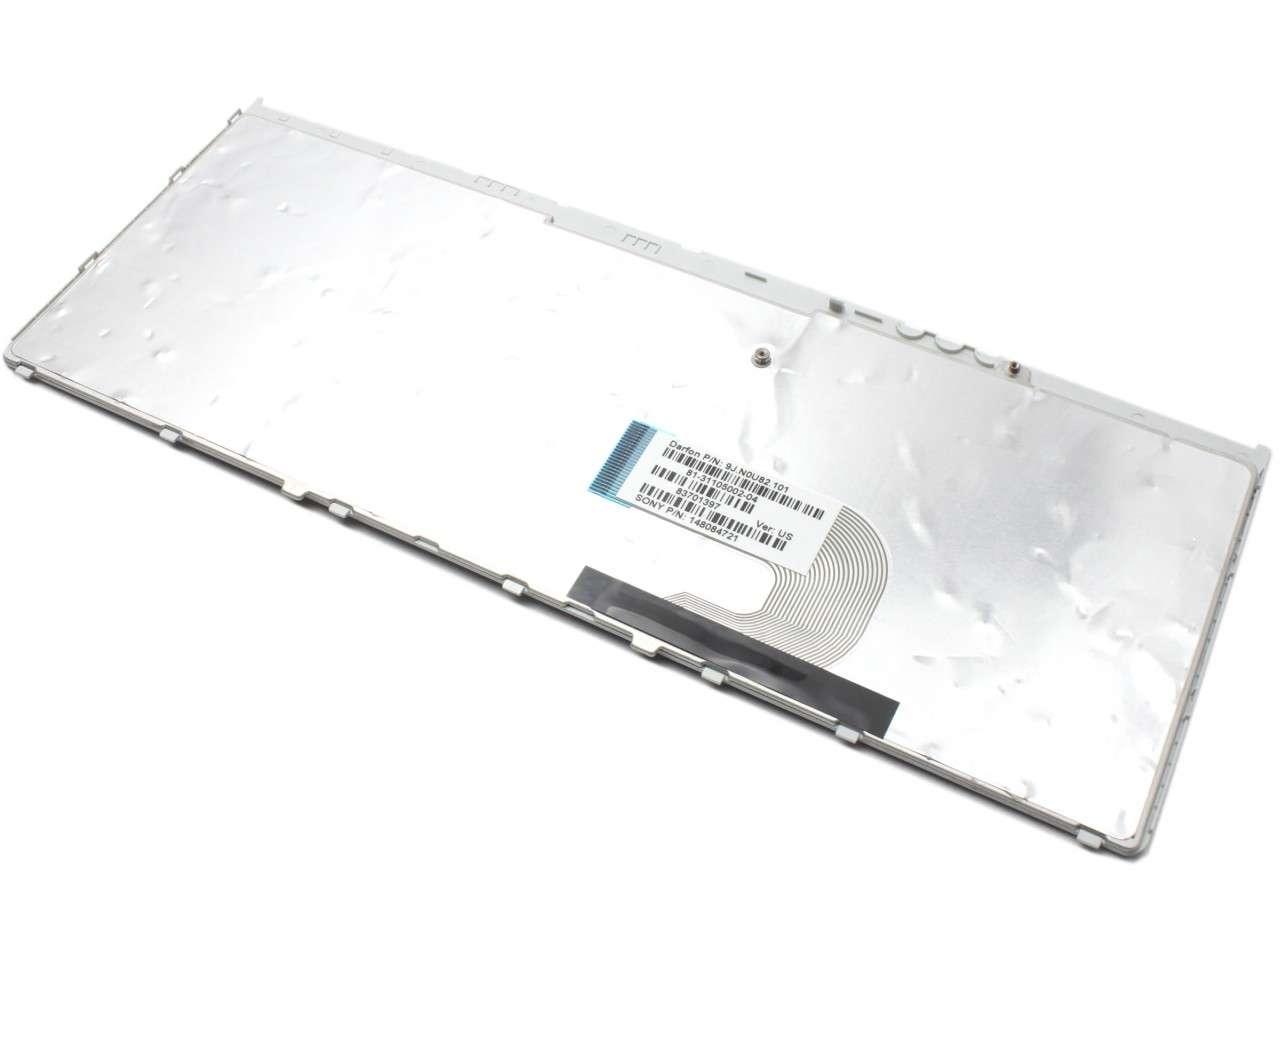 Tastatura Sony Vaio VGN-FW73JGB neagra cu rama gri imagine powerlaptop.ro 2021